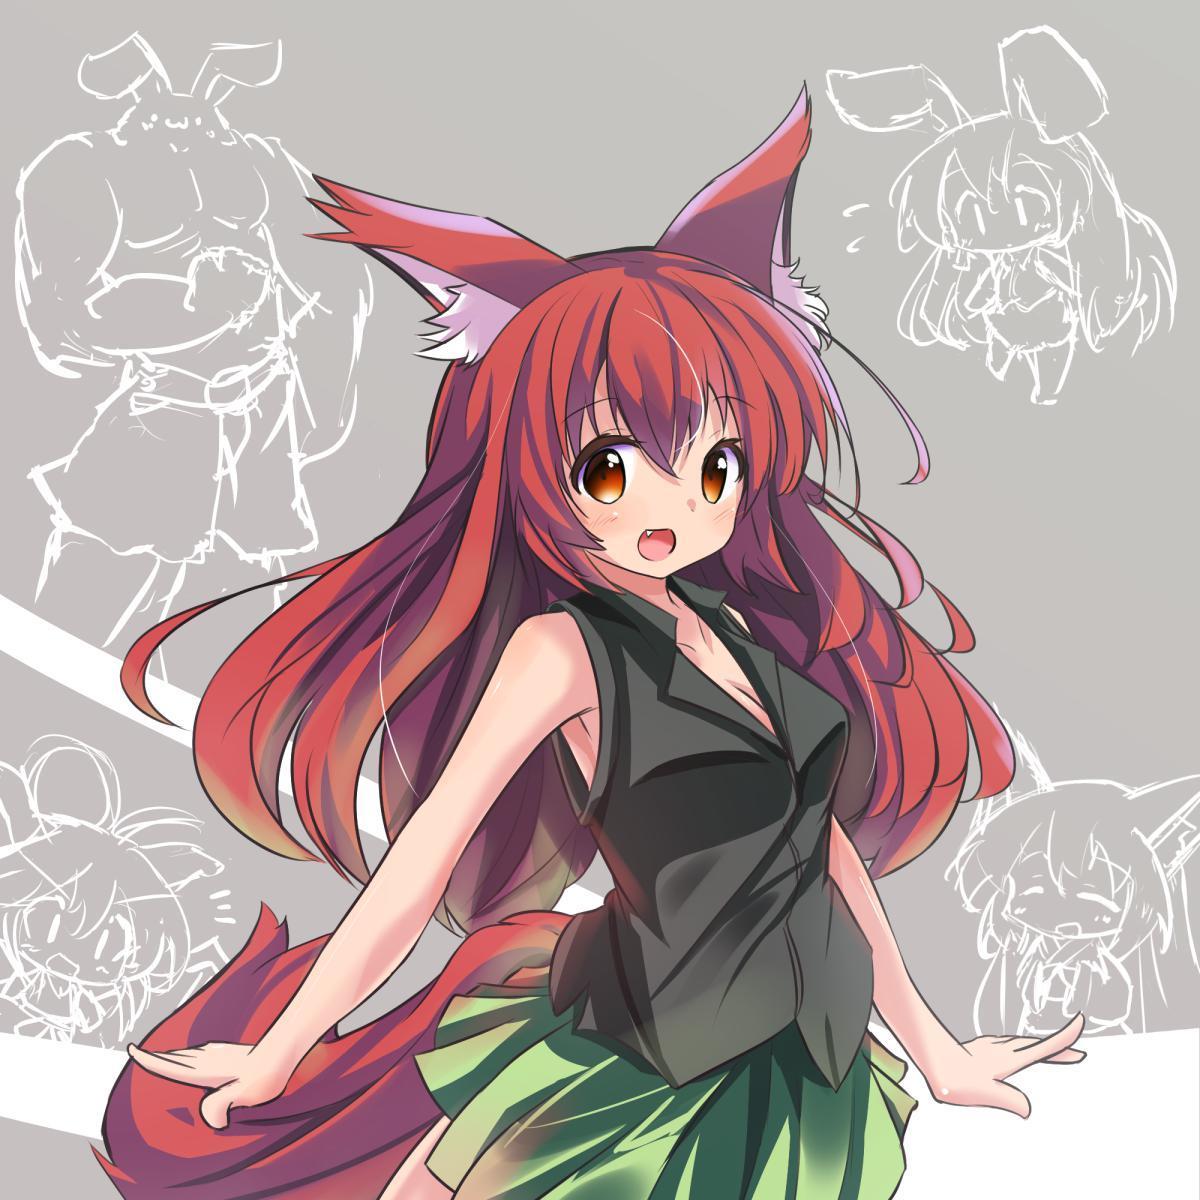 P站画师作品赤狐(不是图标担当的孩子)